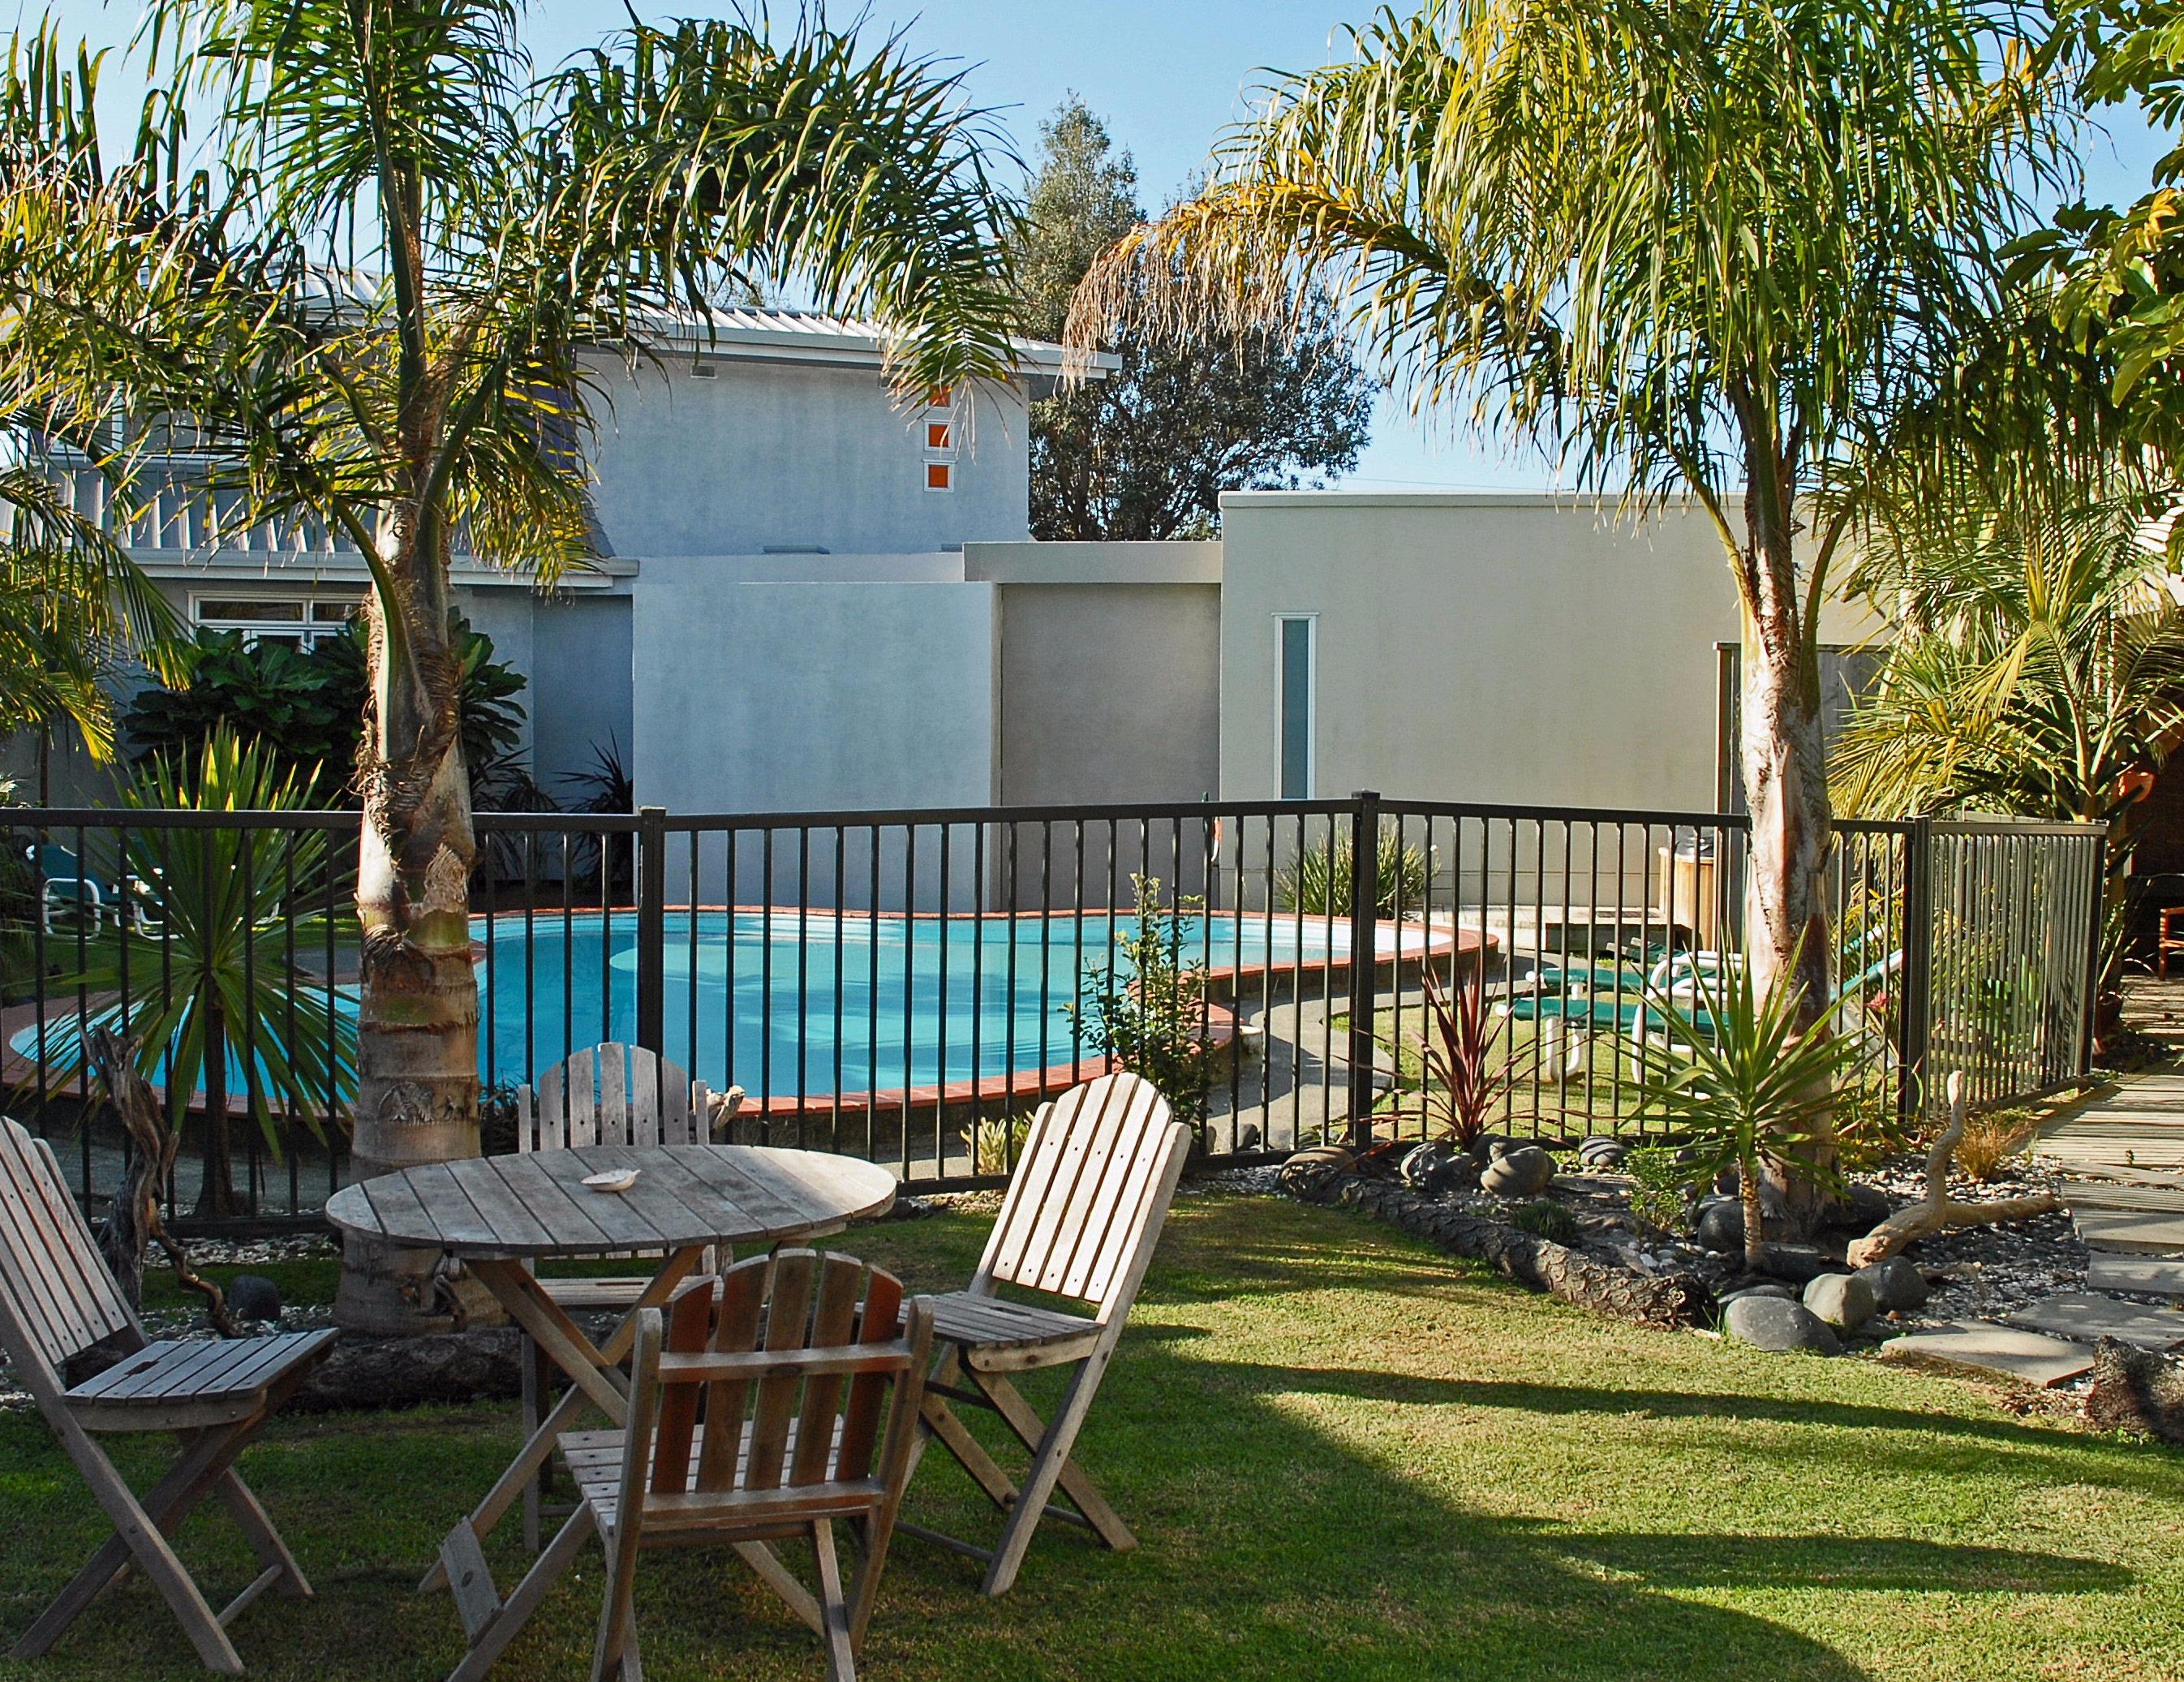 Waipu Cove Resort Ltd